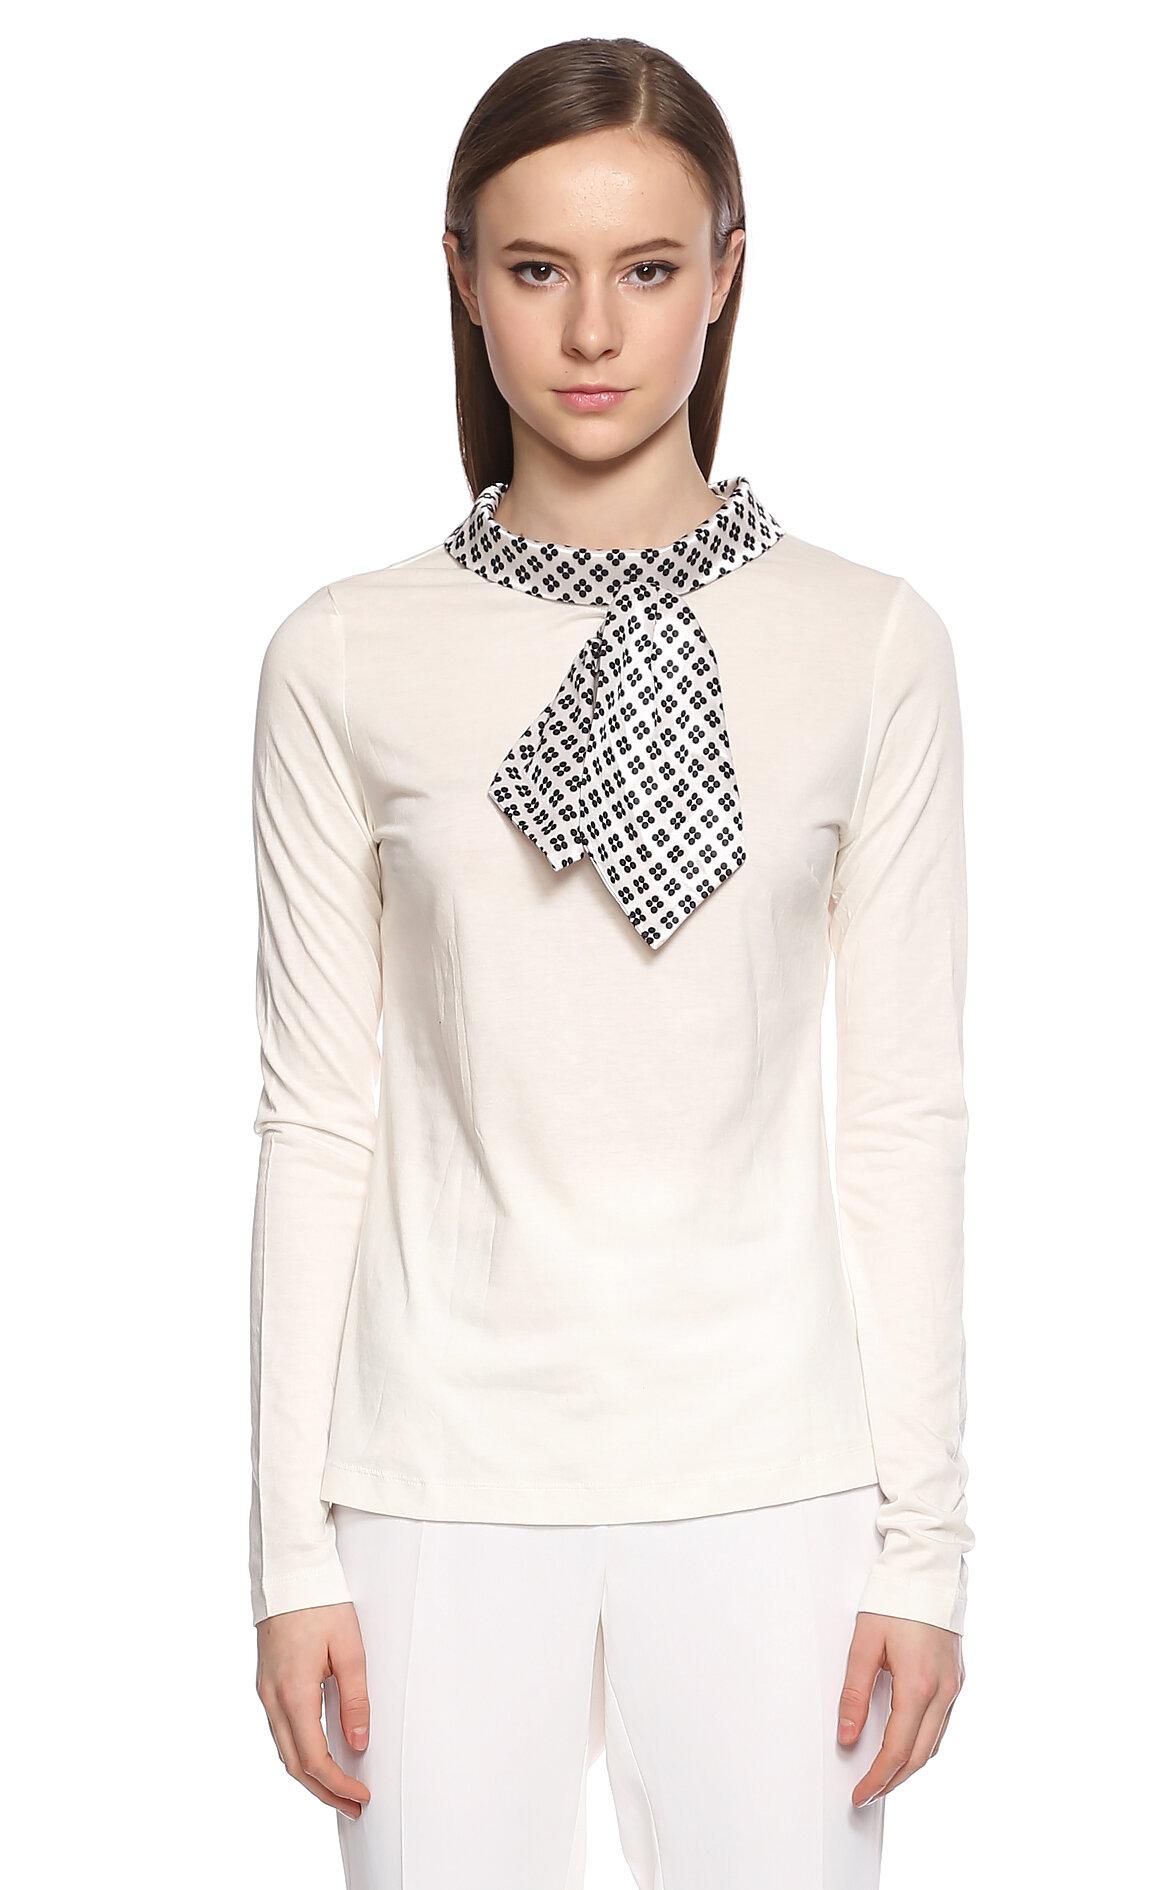 Fornarina Jeans-Fornarina Jeans Şal Yakalı Beyaz T-Shirt